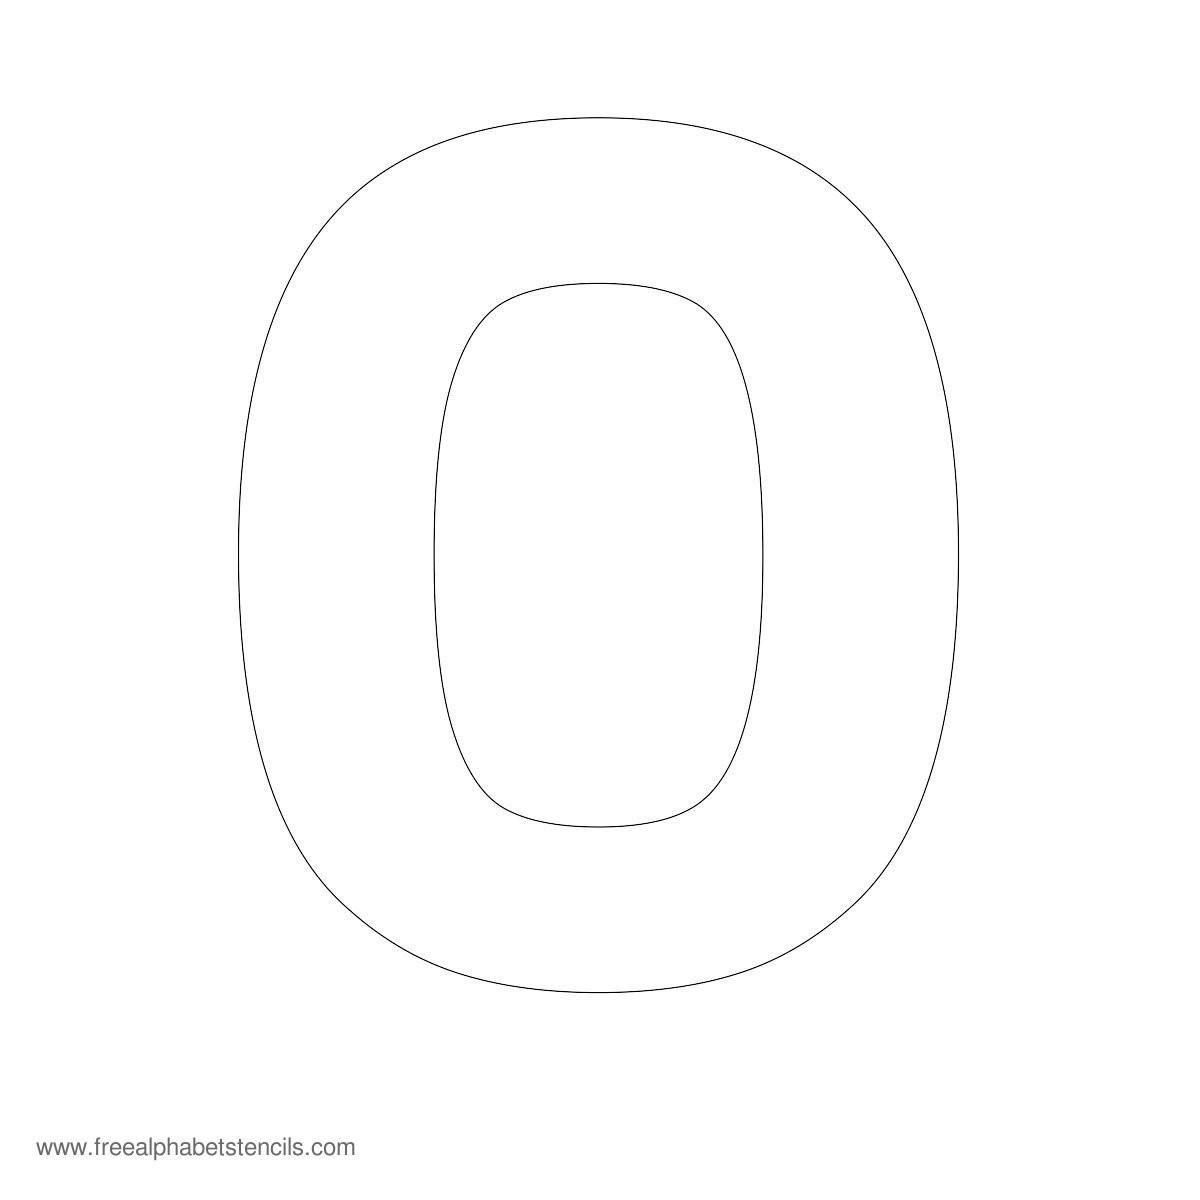 letter o stencil template  Large Alphabet Stencils - FreeAlphabetStencils